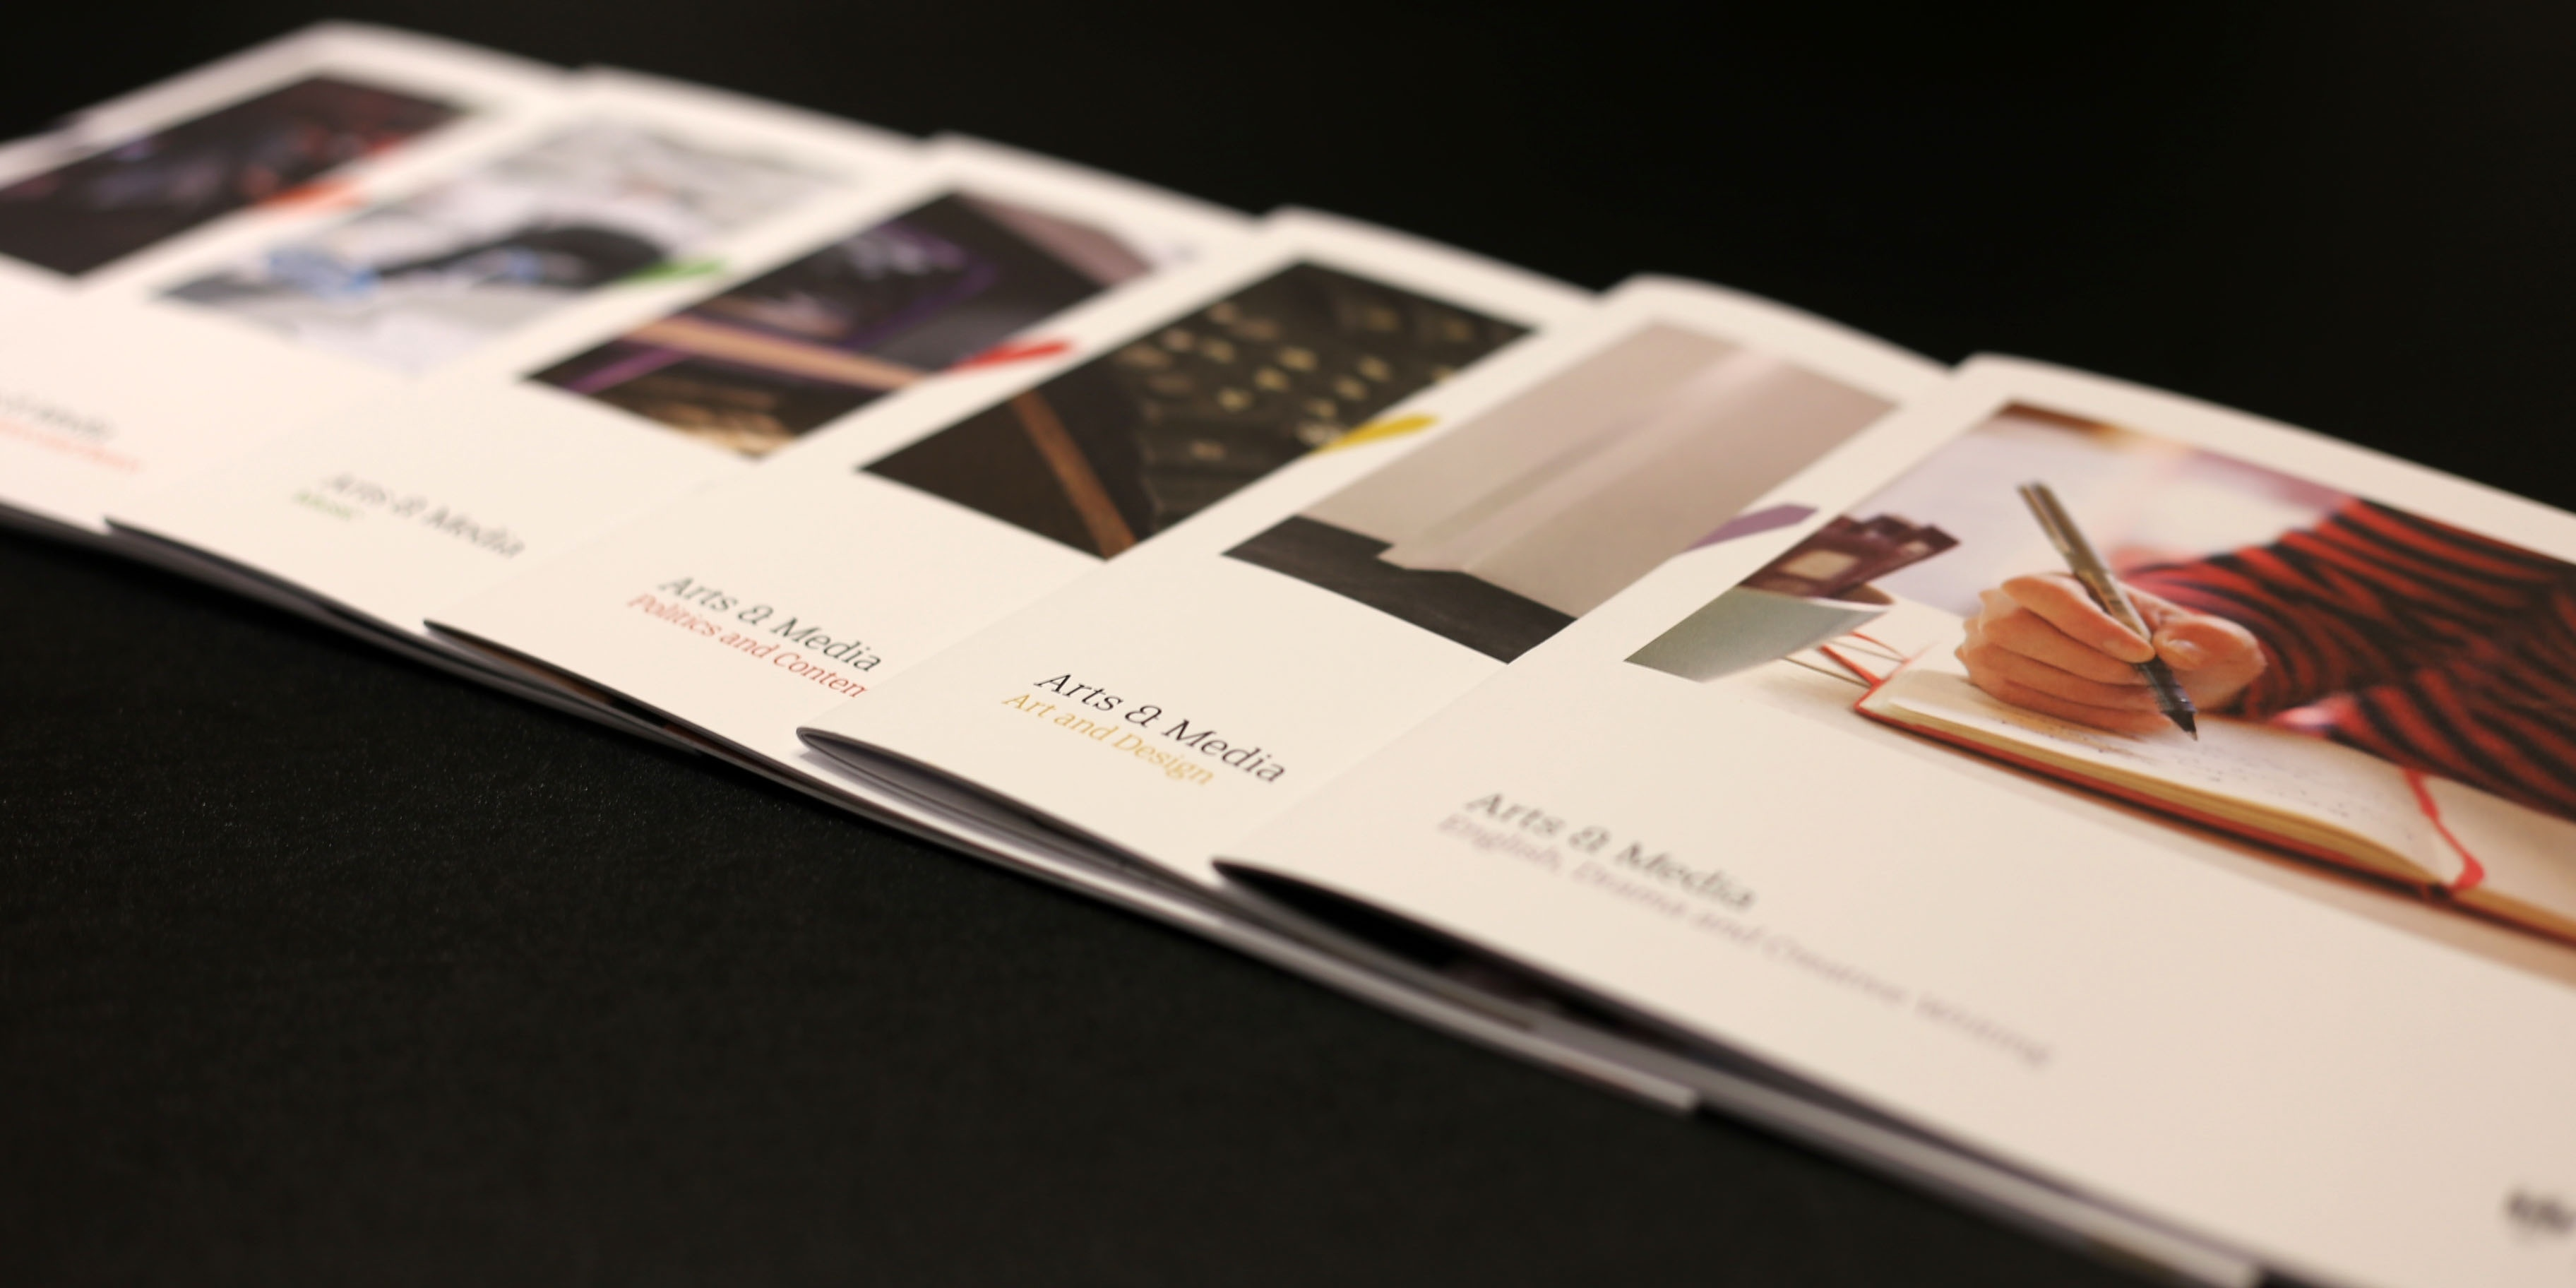 brochures on table printed on luxury printing paper